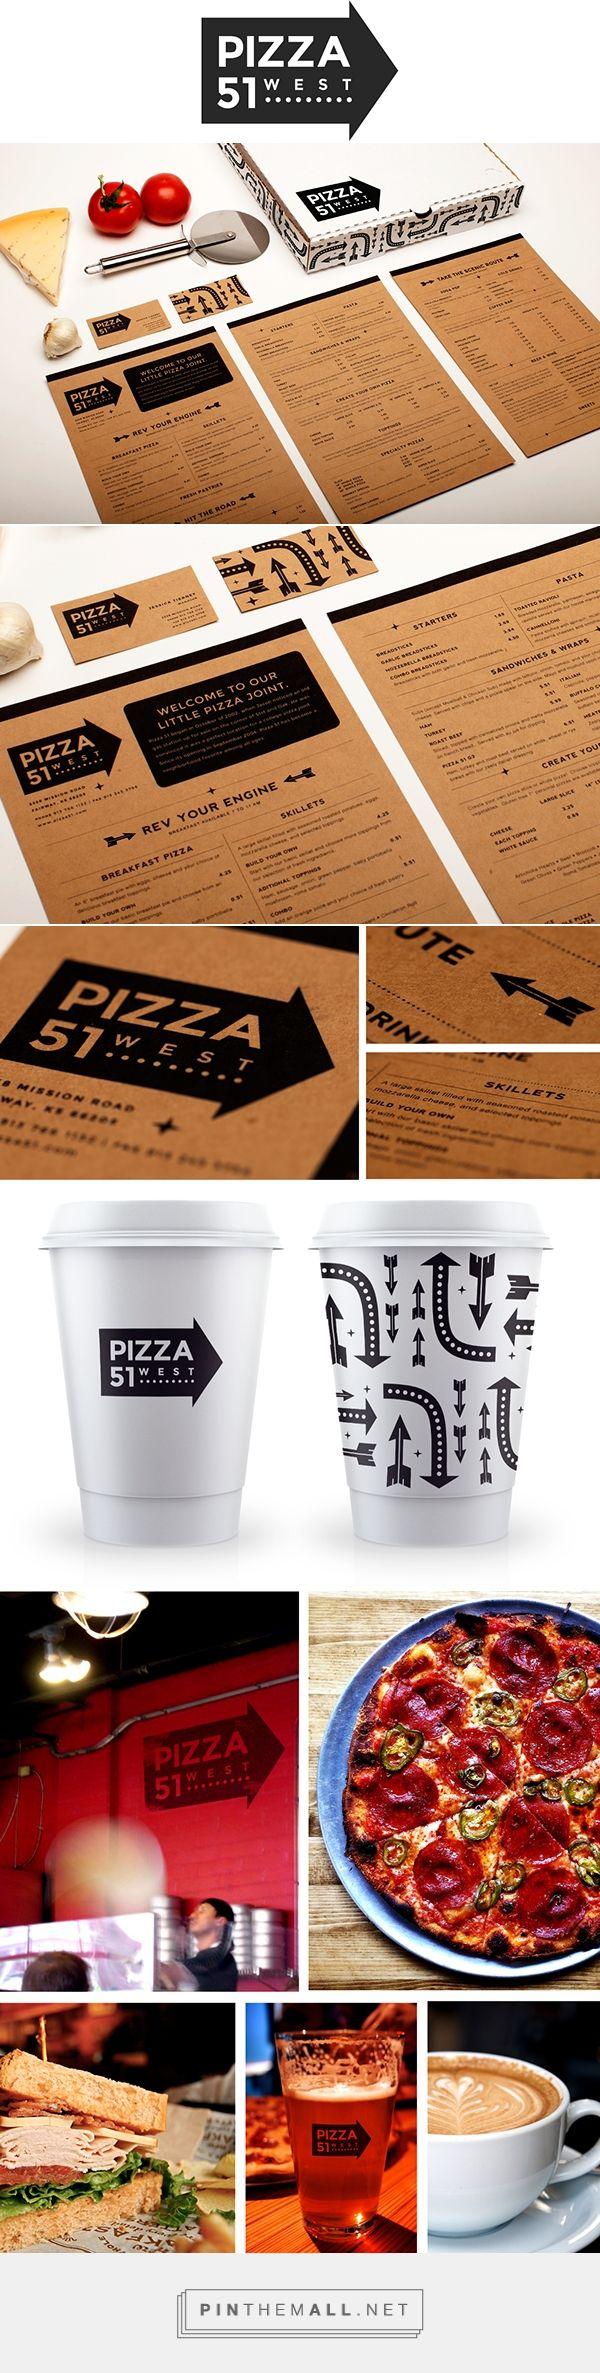 Restaurant designs restaurant logo creator restaurant logo maker - Find This Pin And More On Menu Restaurant Branding